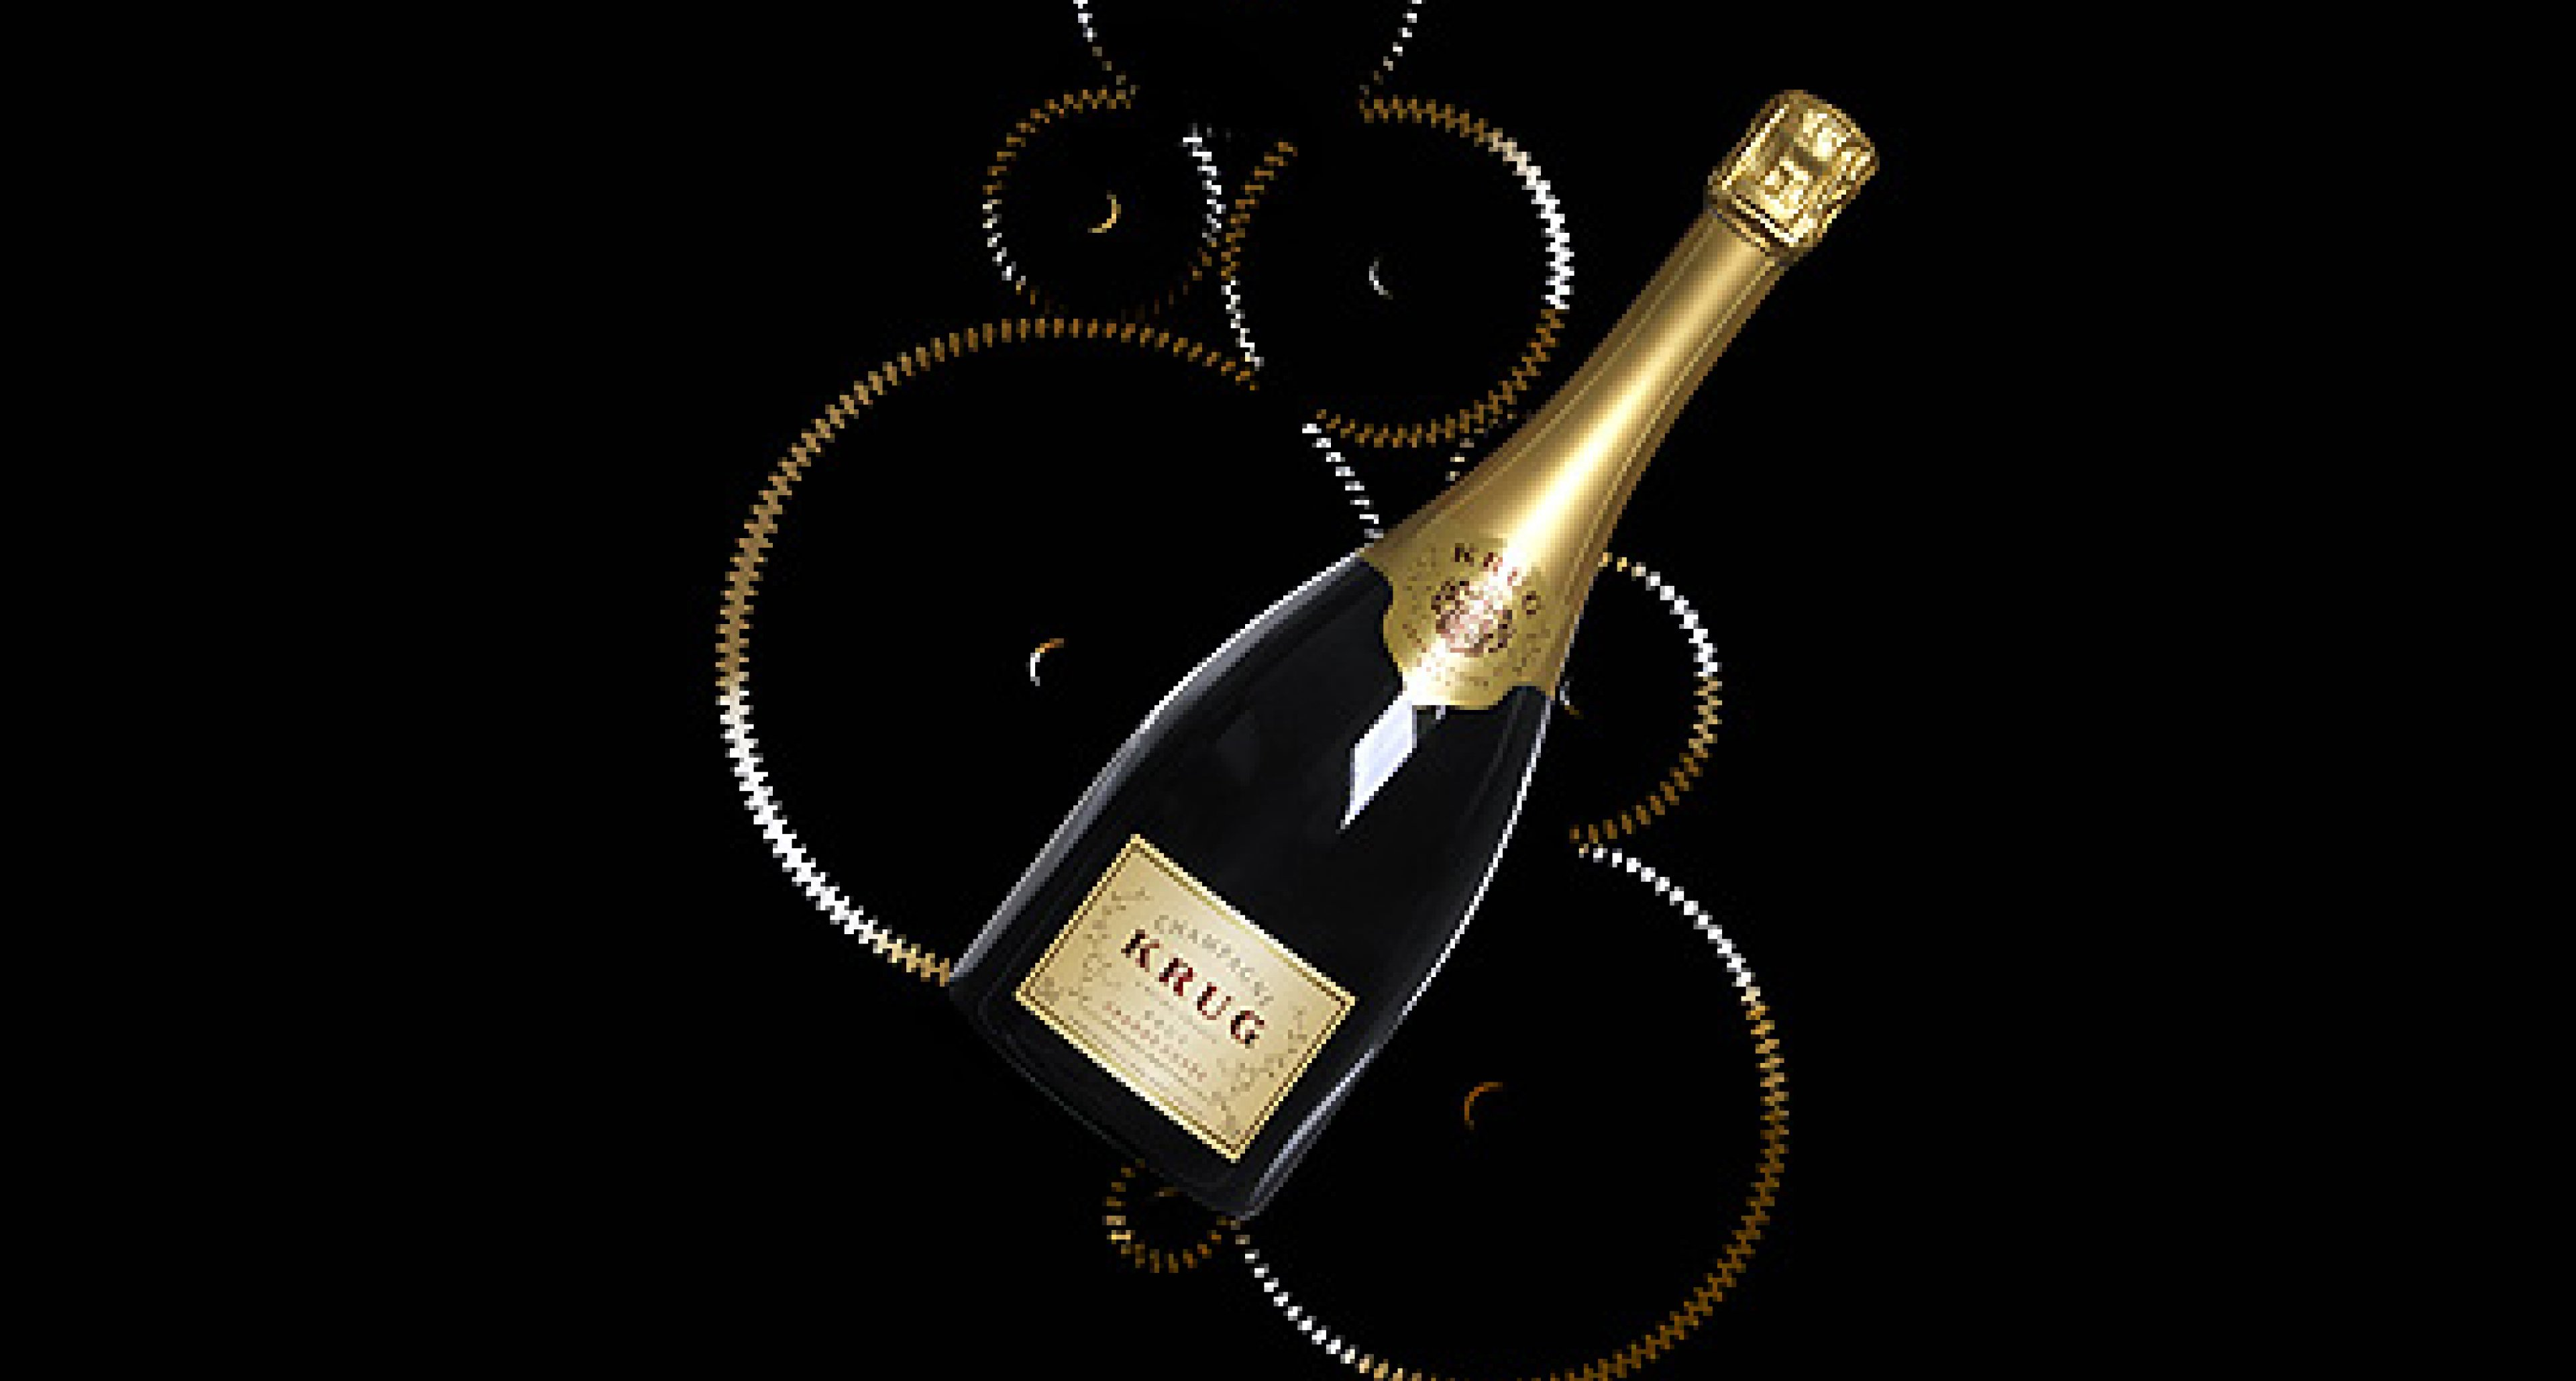 Krug Champagne: Record Price for 1928 Bottle